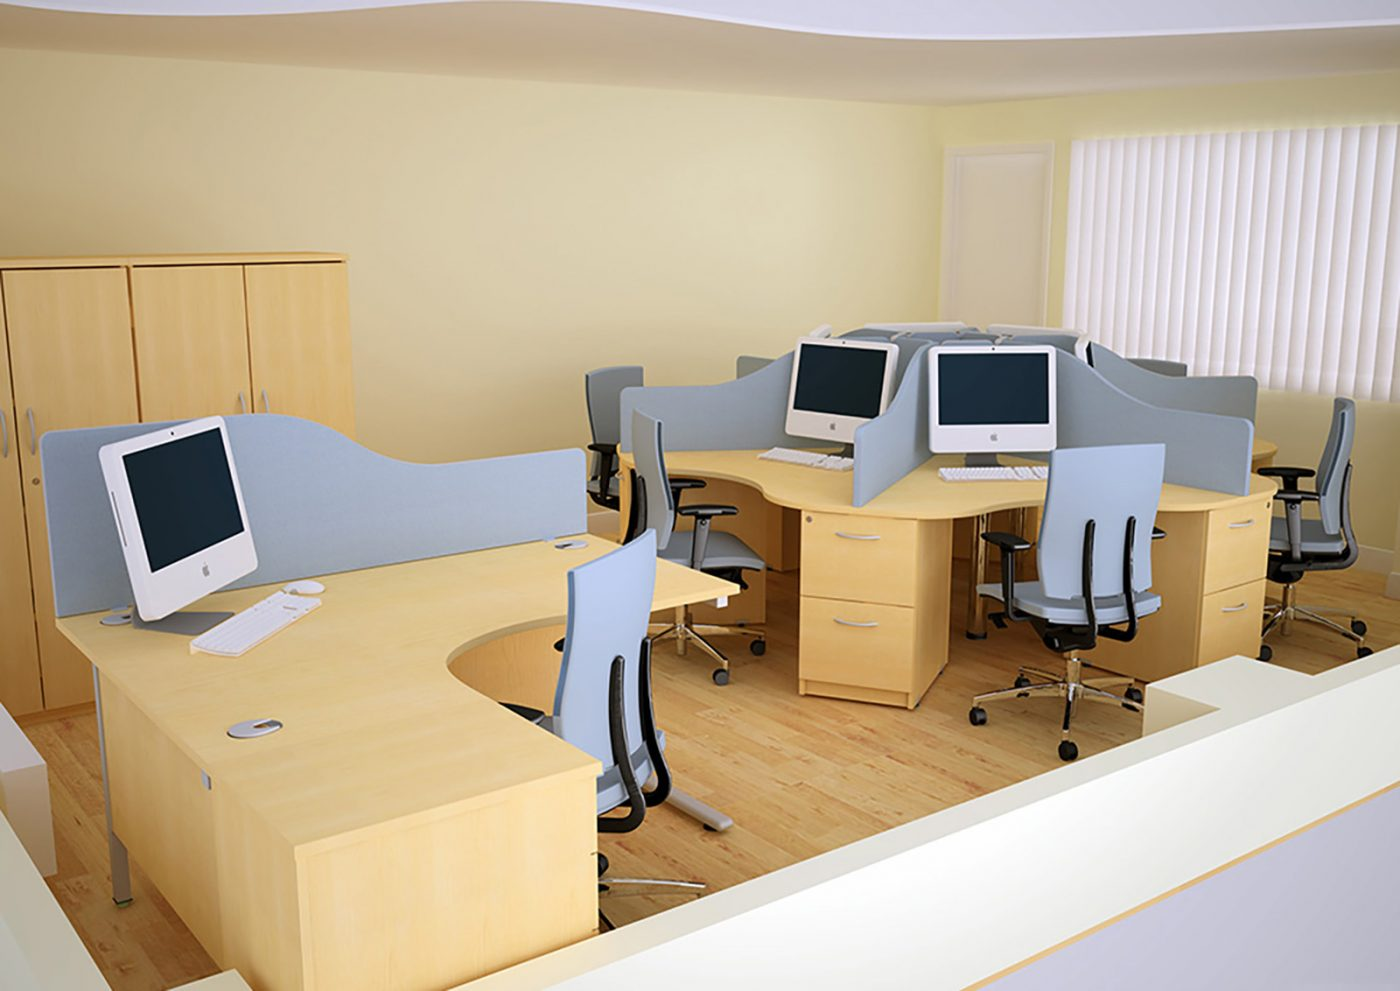 call centre furniture, core units, j shape desk, desktop screen, MFC